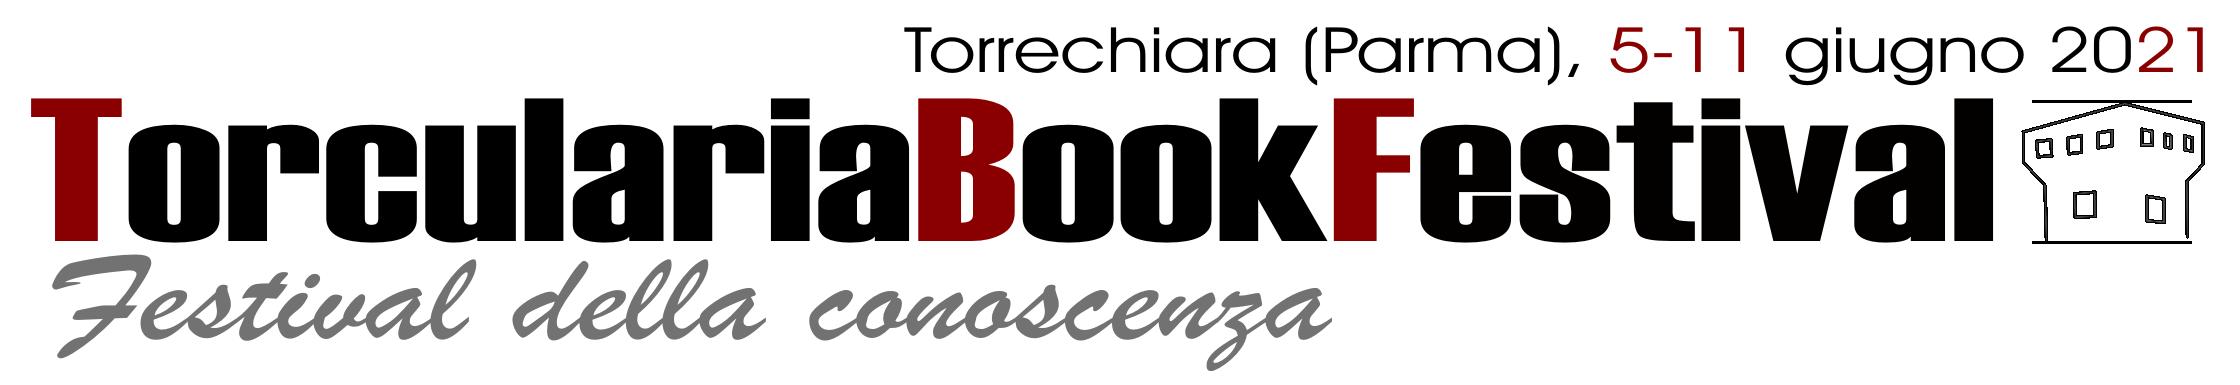 Torcularia Book Festival